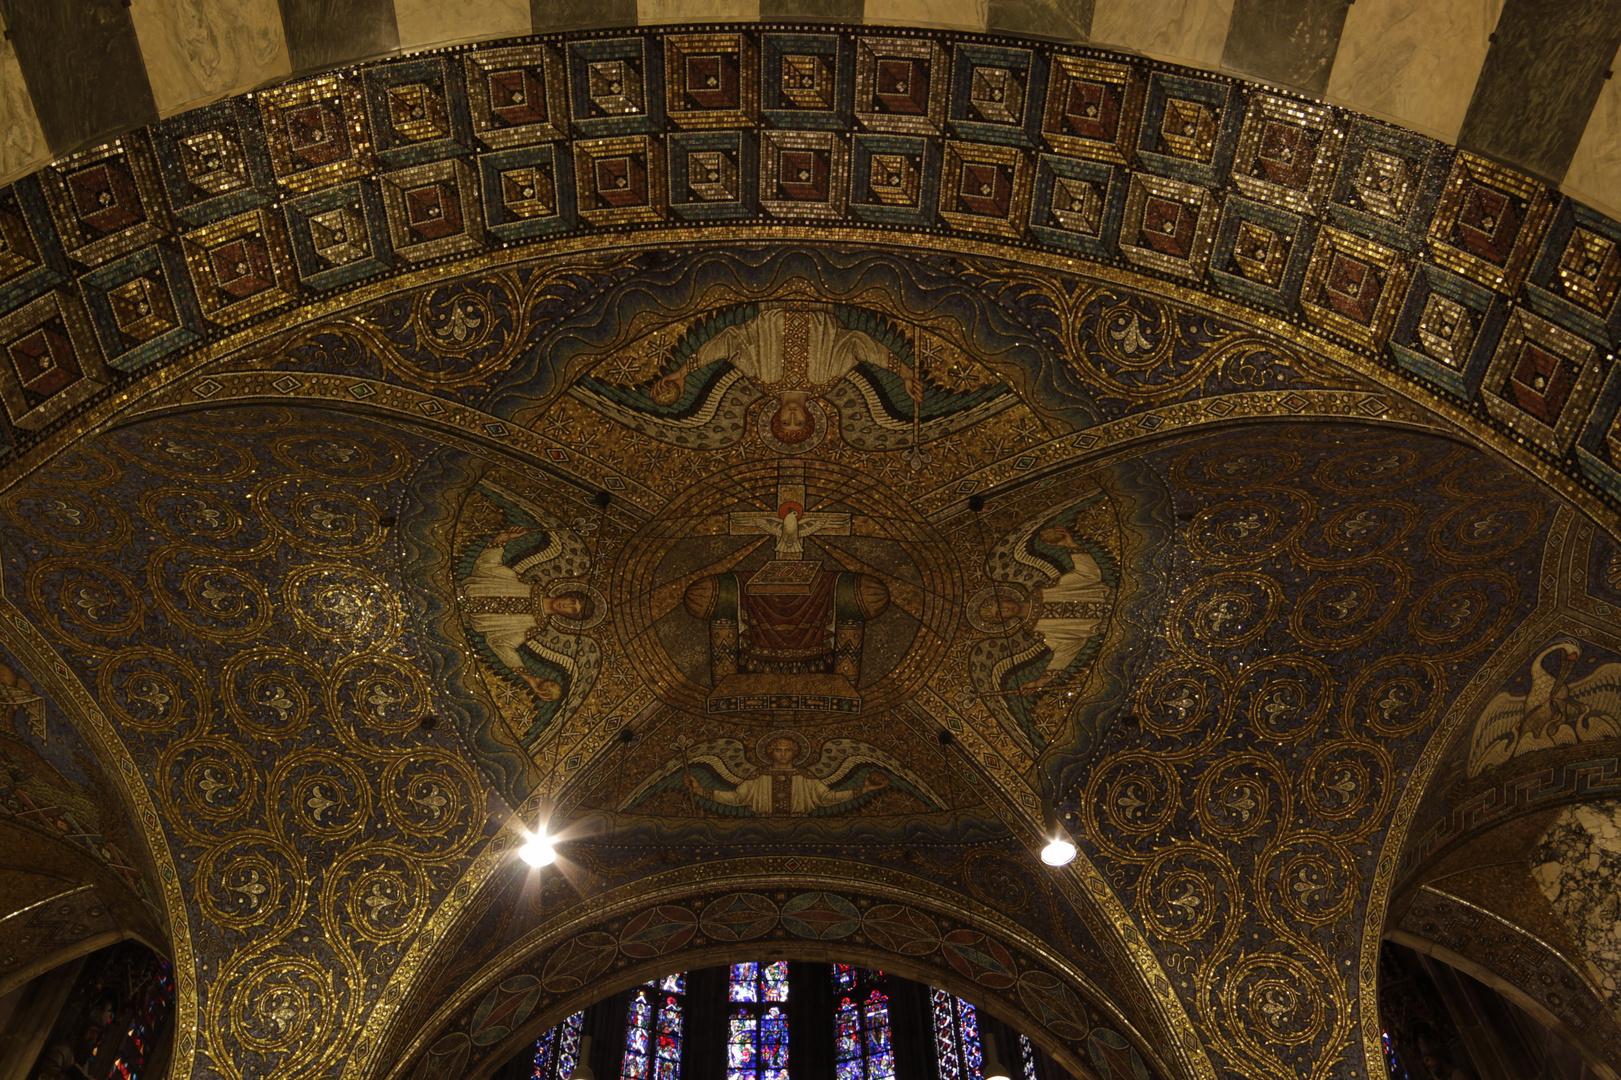 altarmosaik